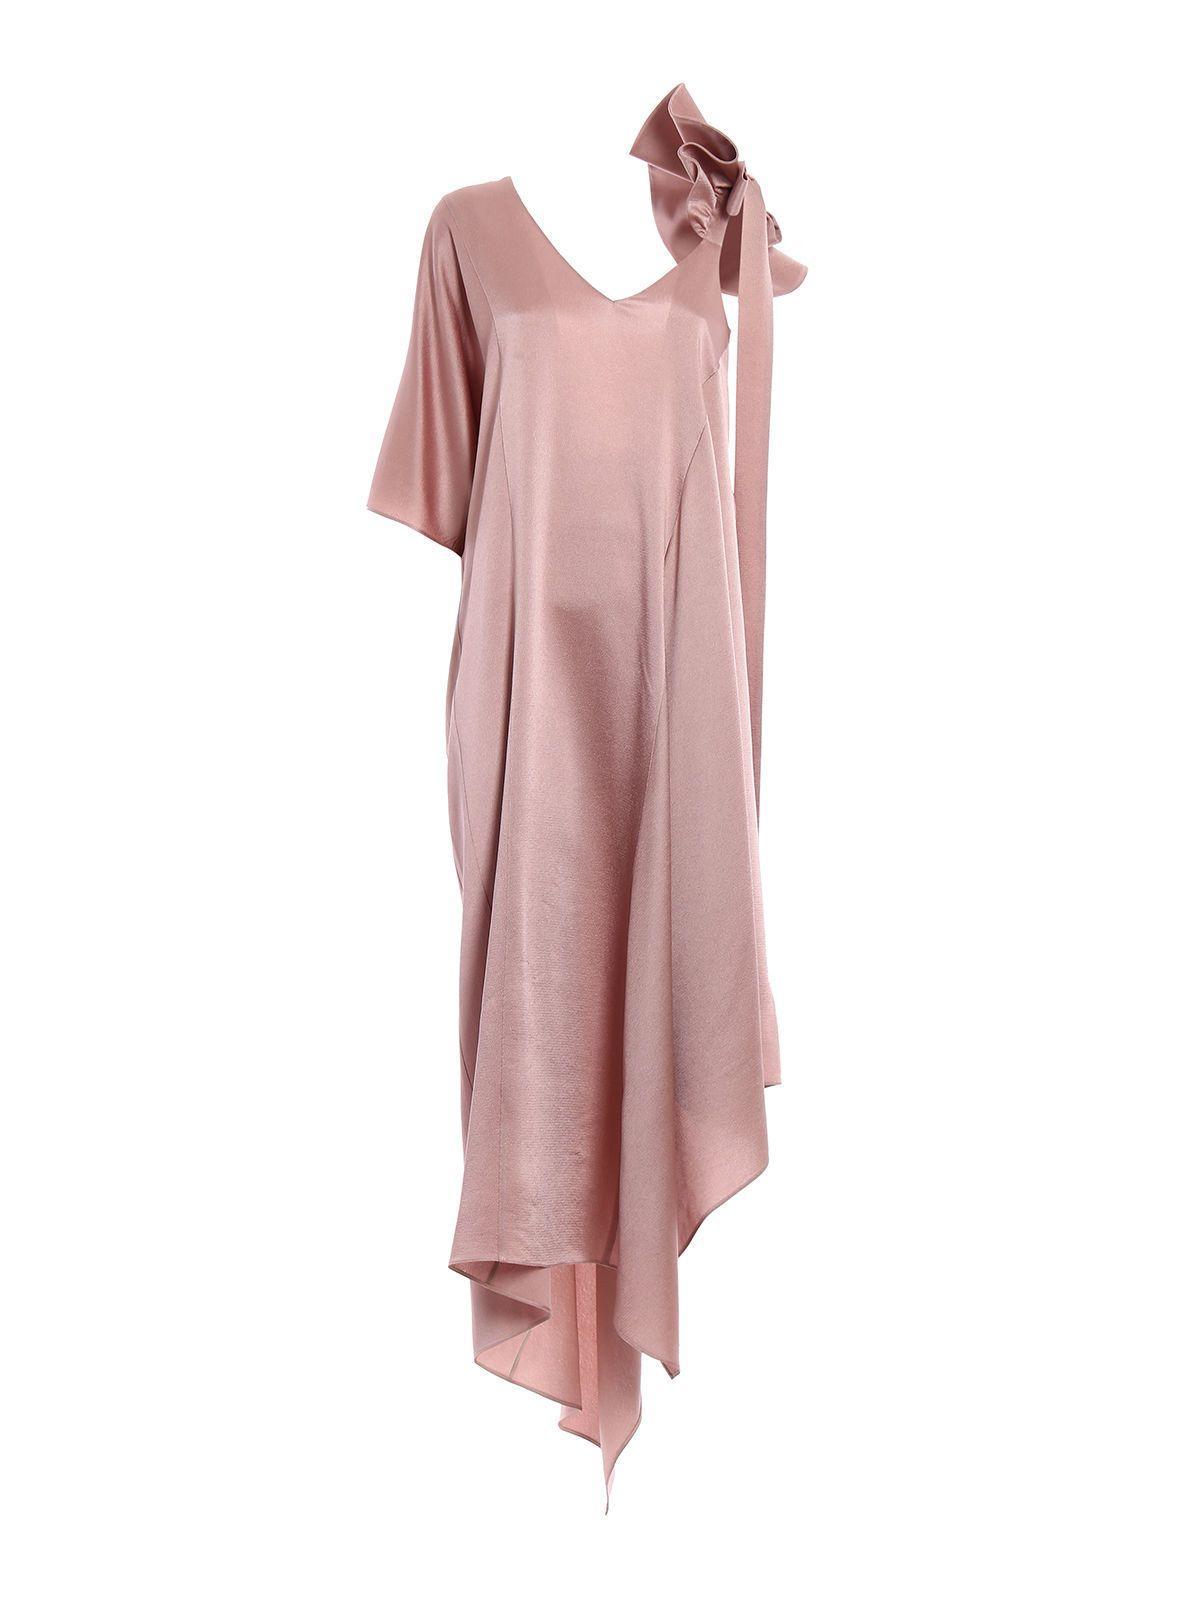 Valentino Long Dress In Ddusty Rose